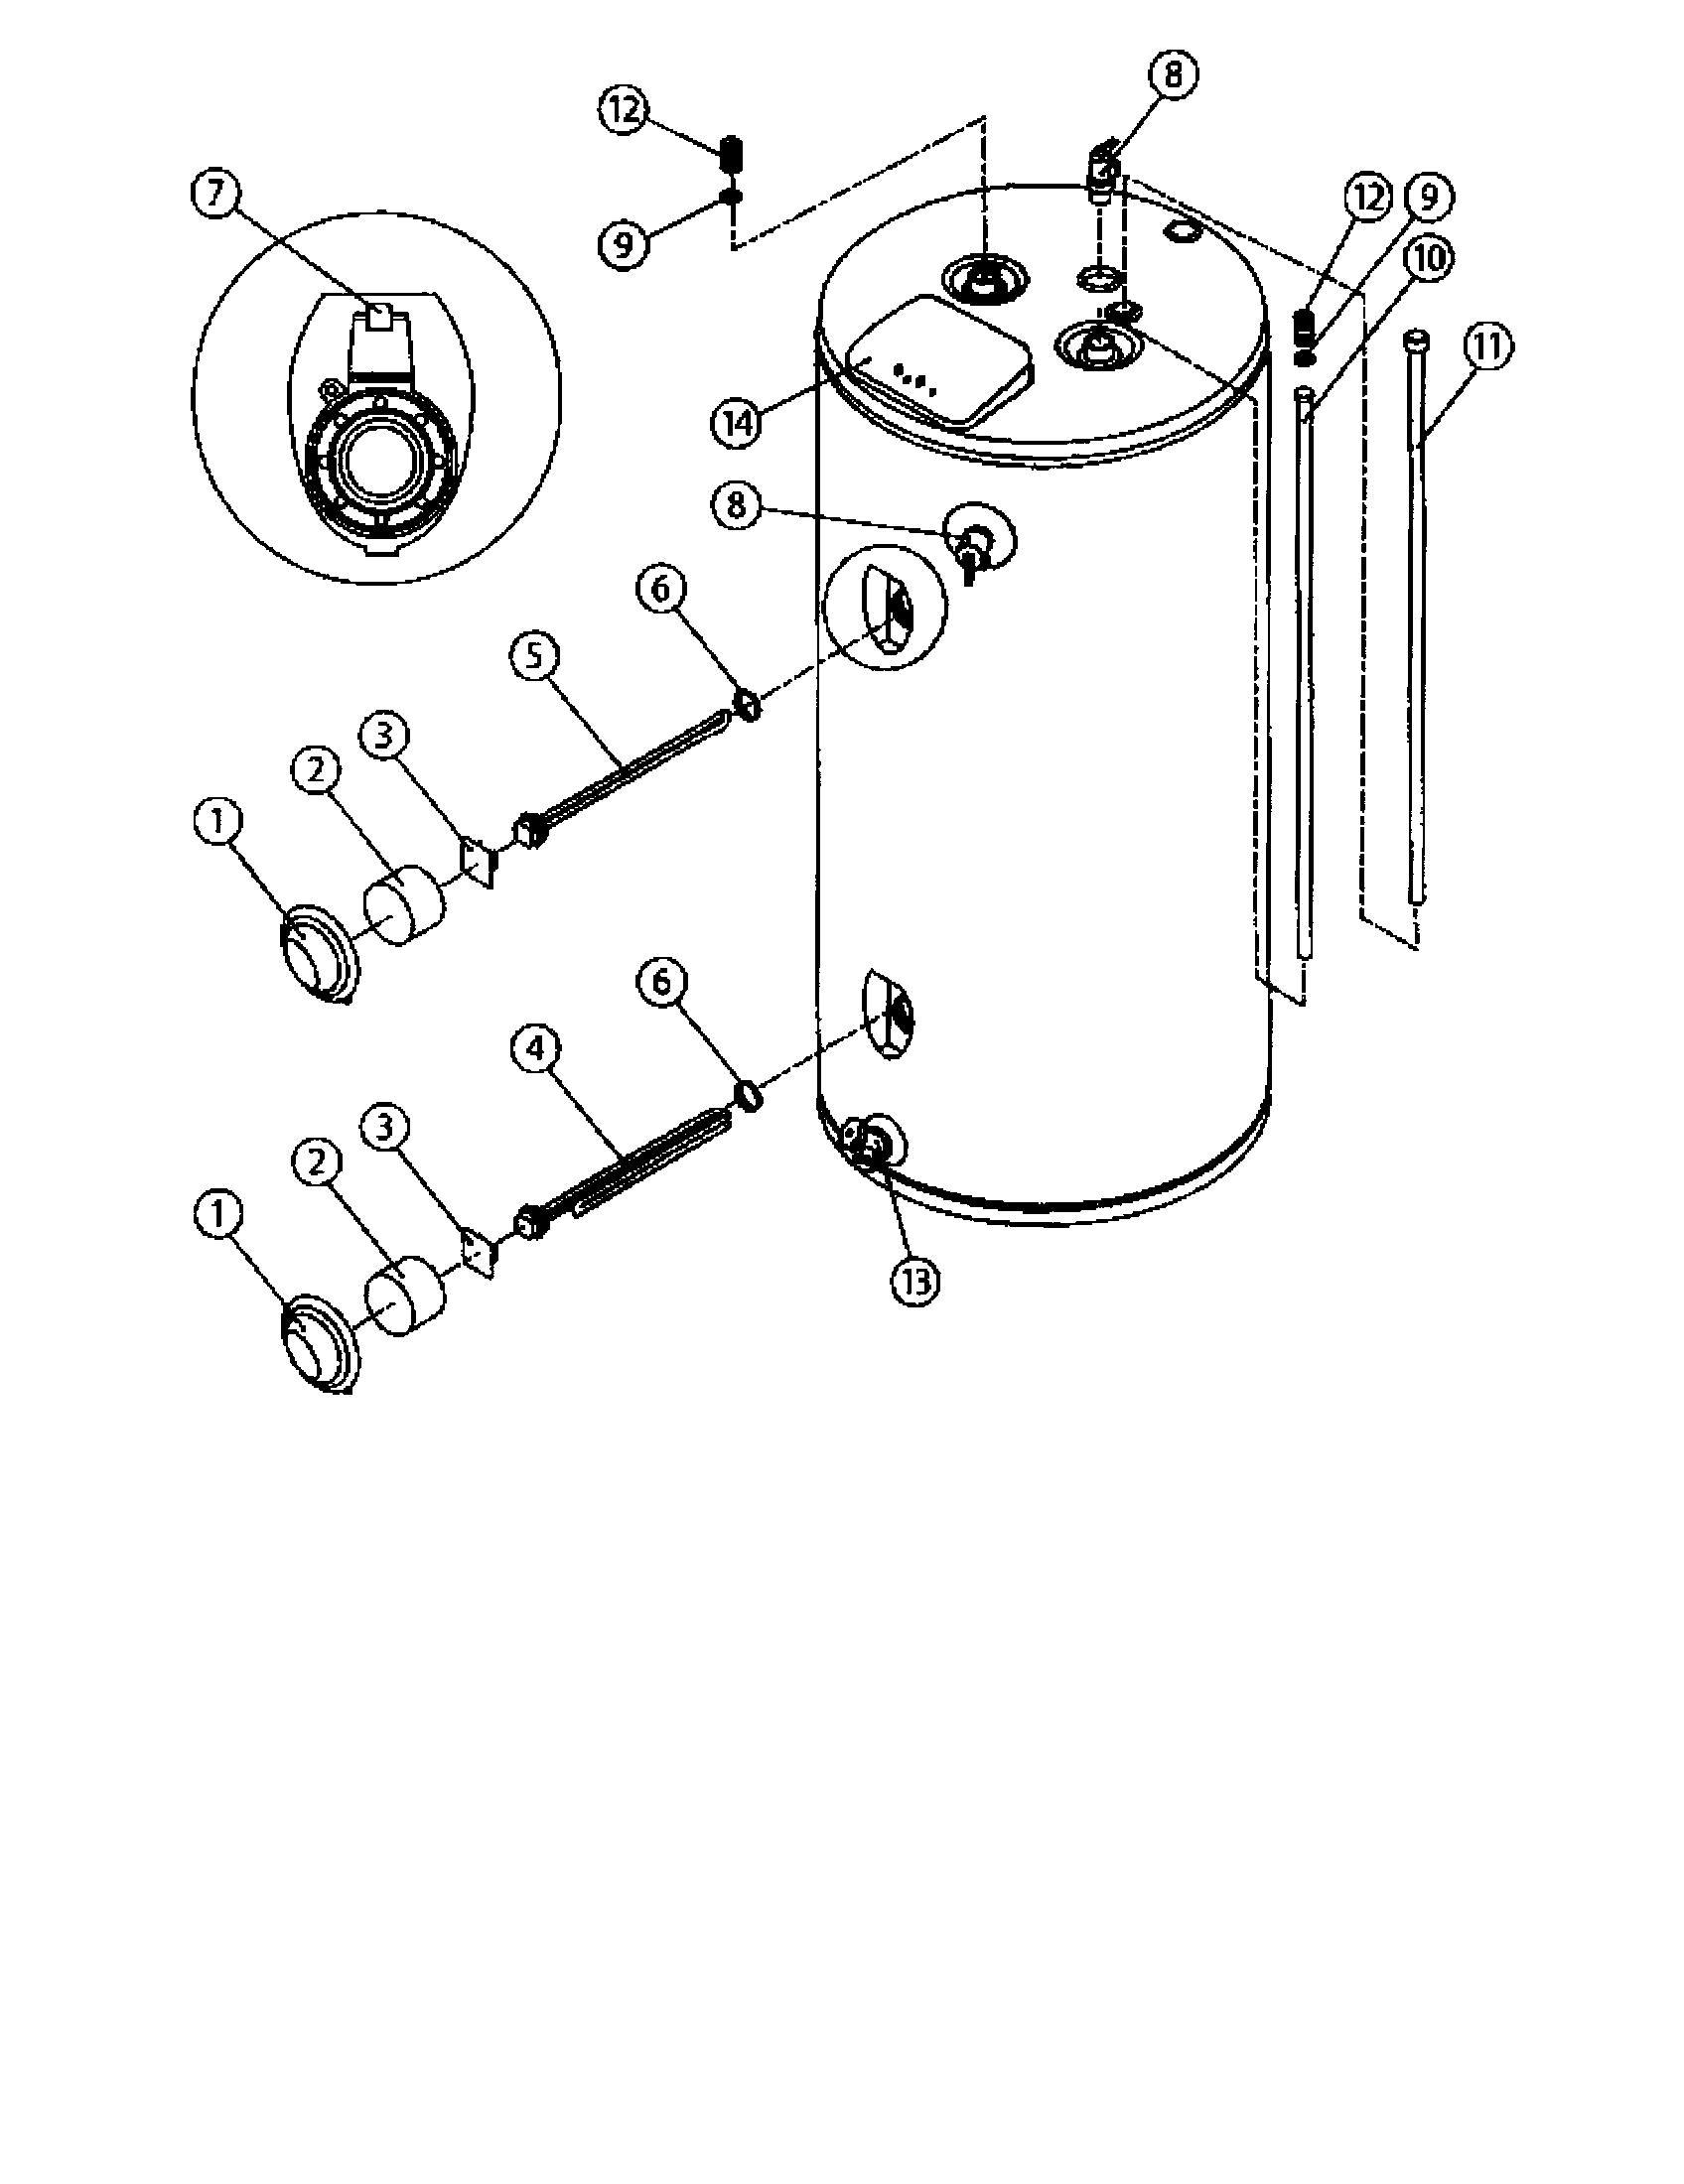 hight resolution of american waterheaters water heater parts model order whirlpool water heater parts whirlpool hot water heater parts